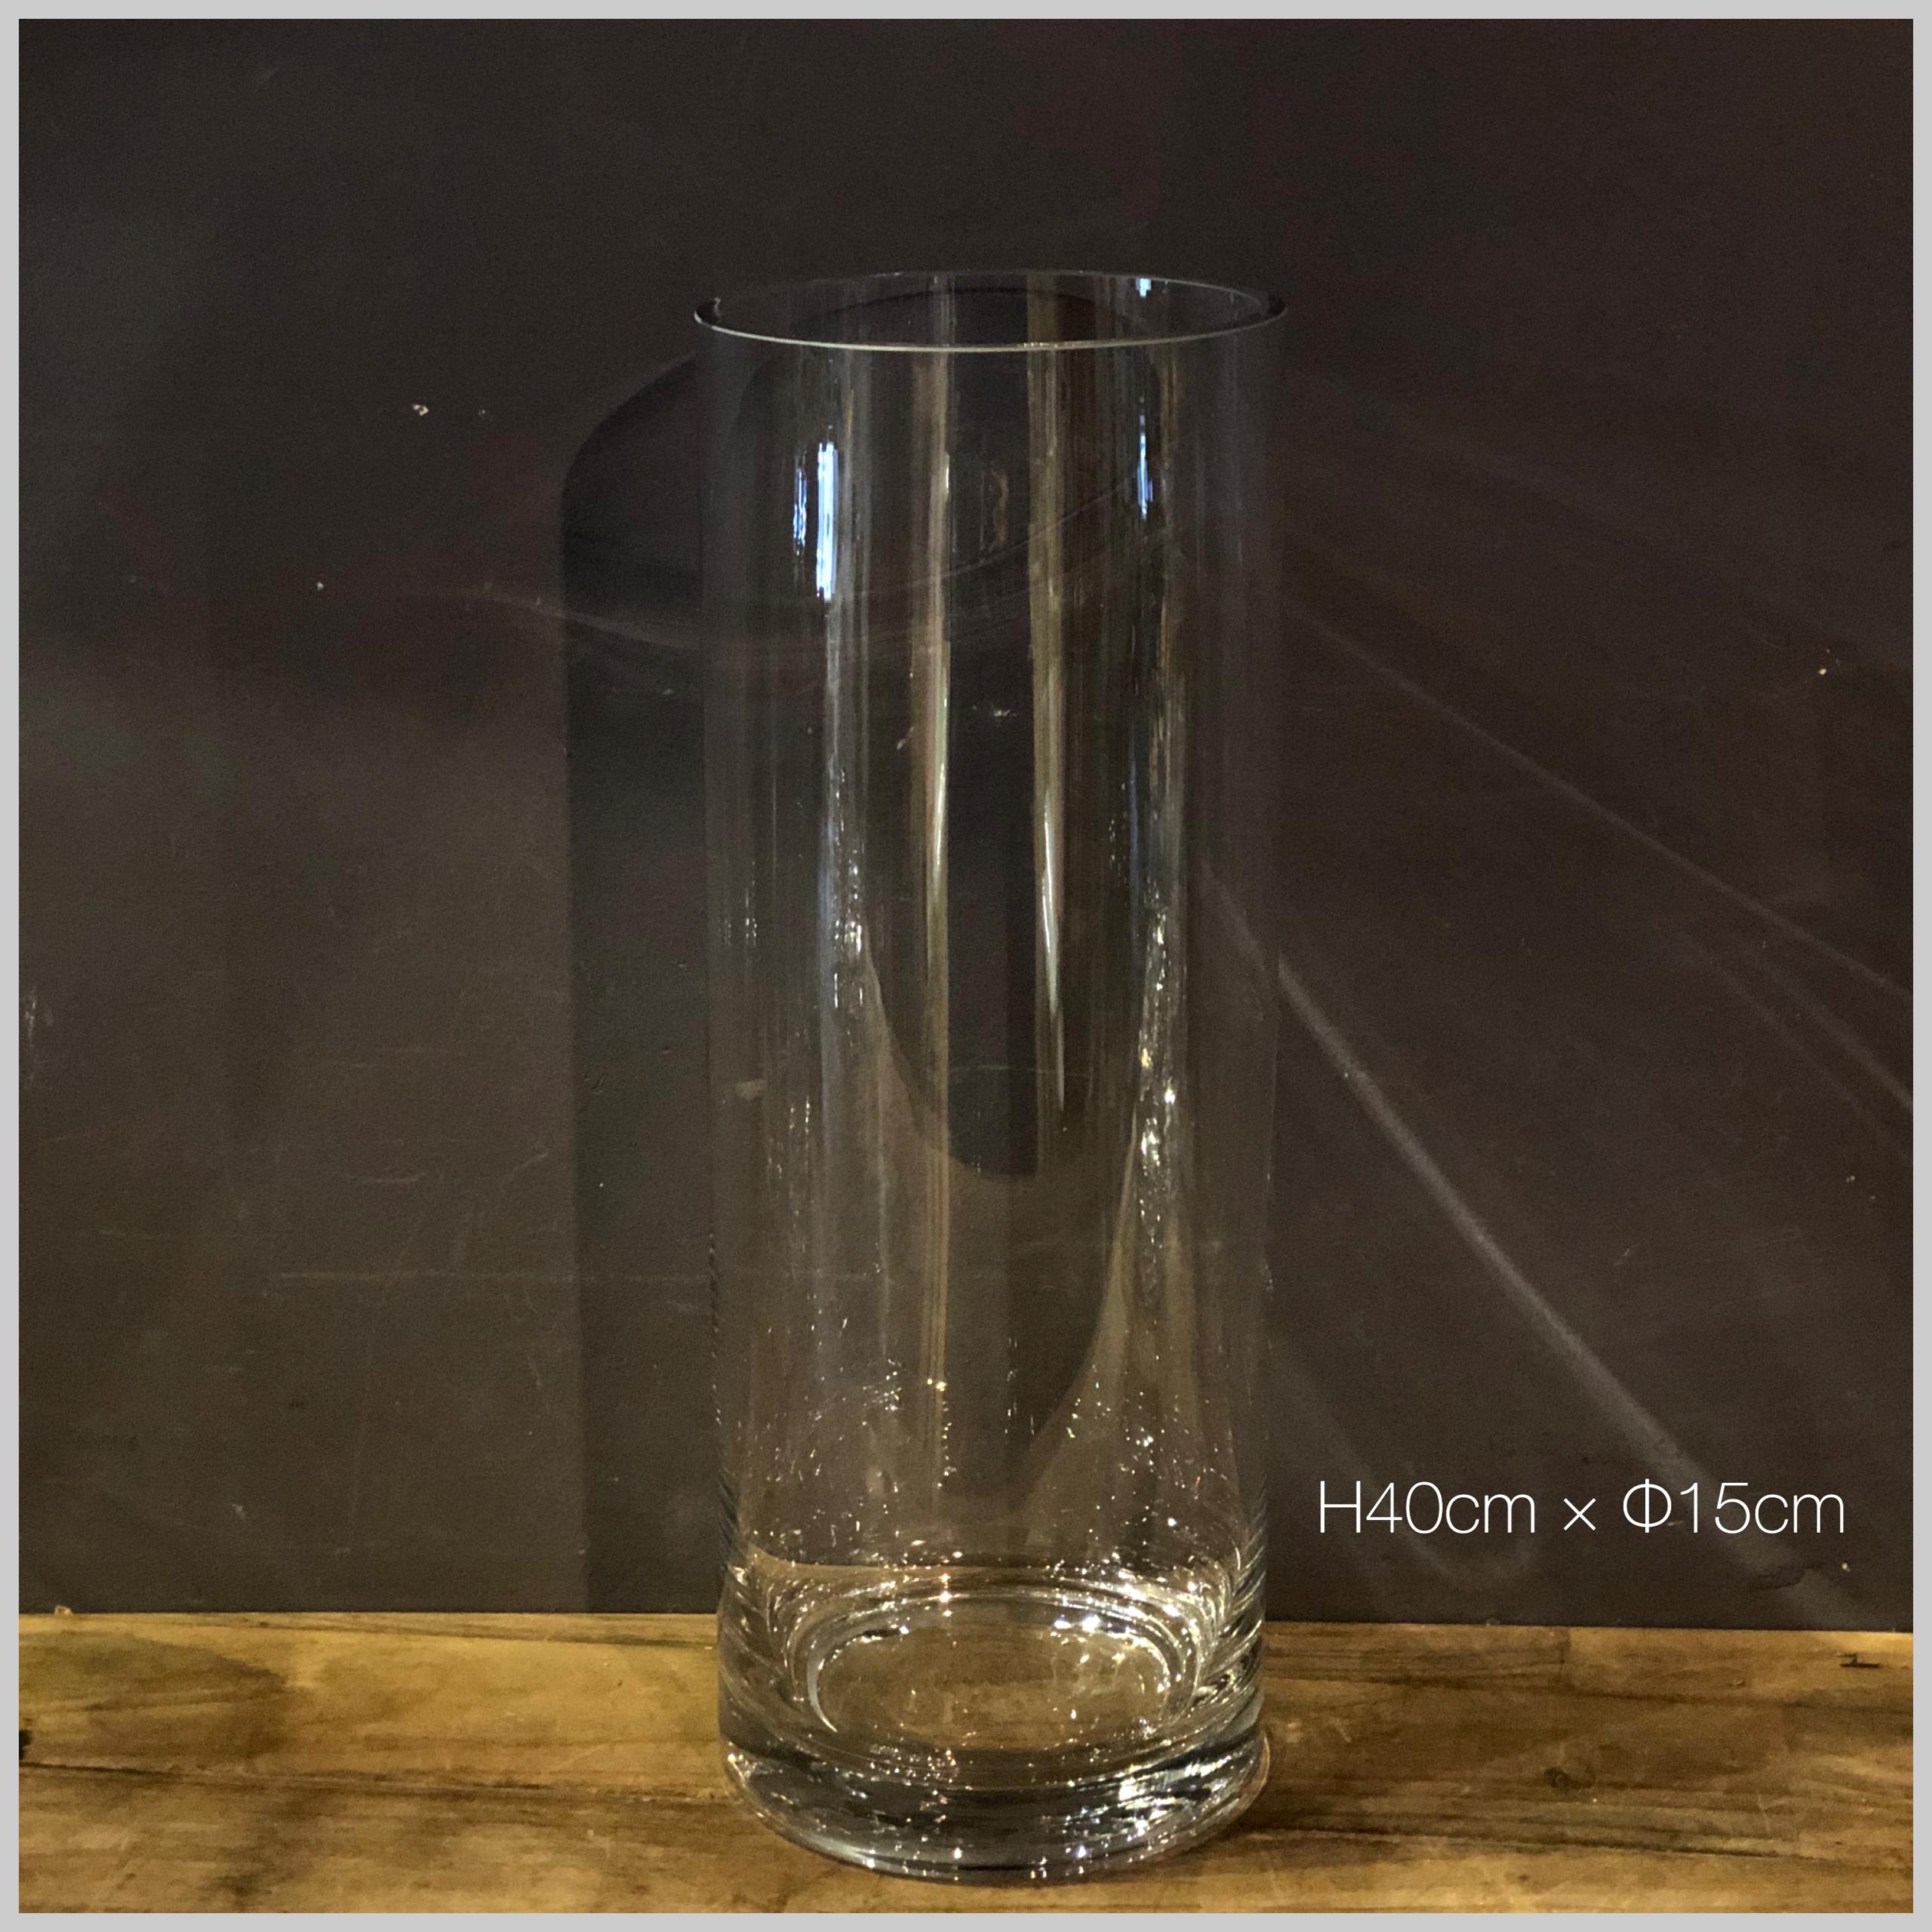 vase0004-round-fat-slim